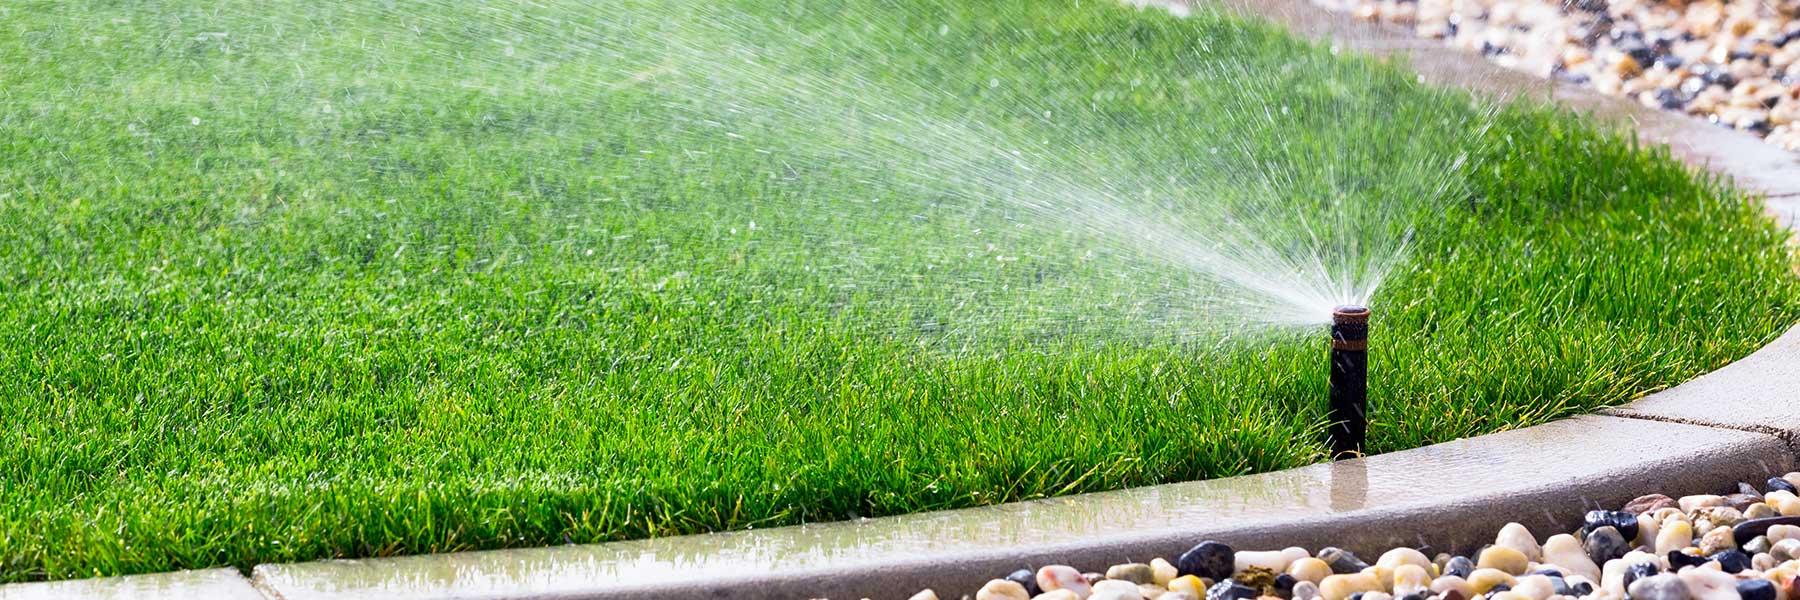 IrrigationHeader